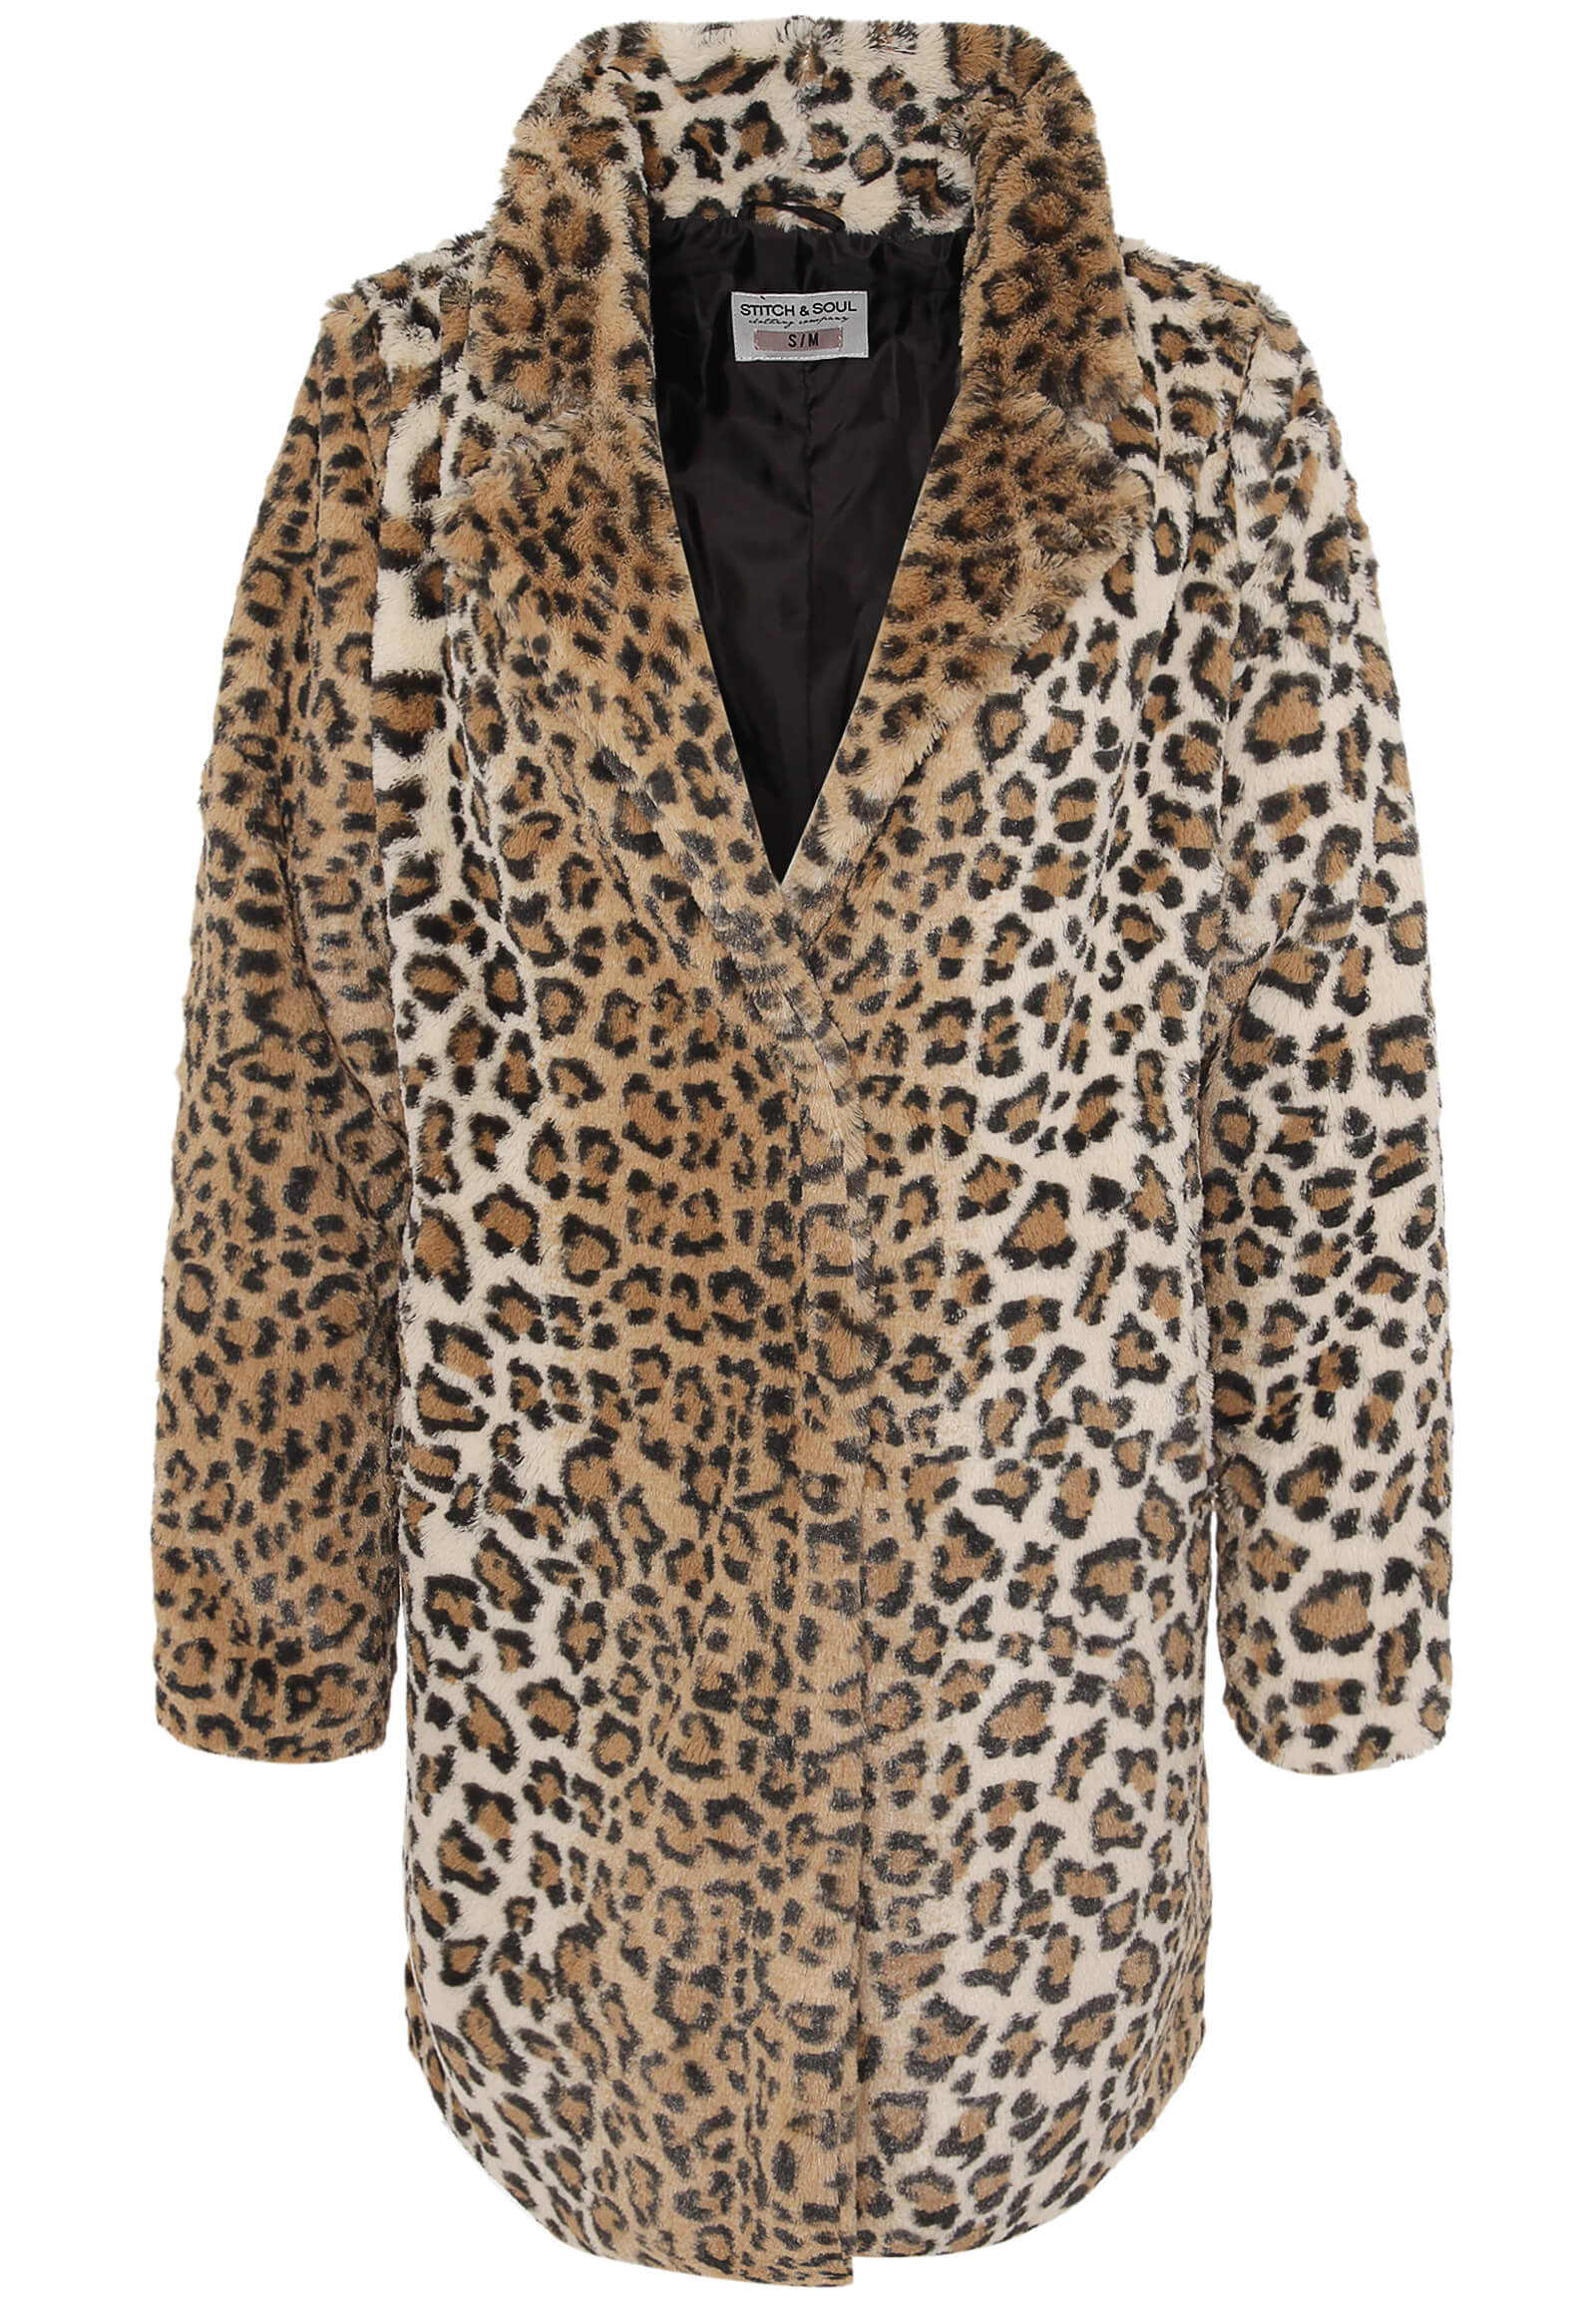 Pelz-Mantel mit Leoparden Muster